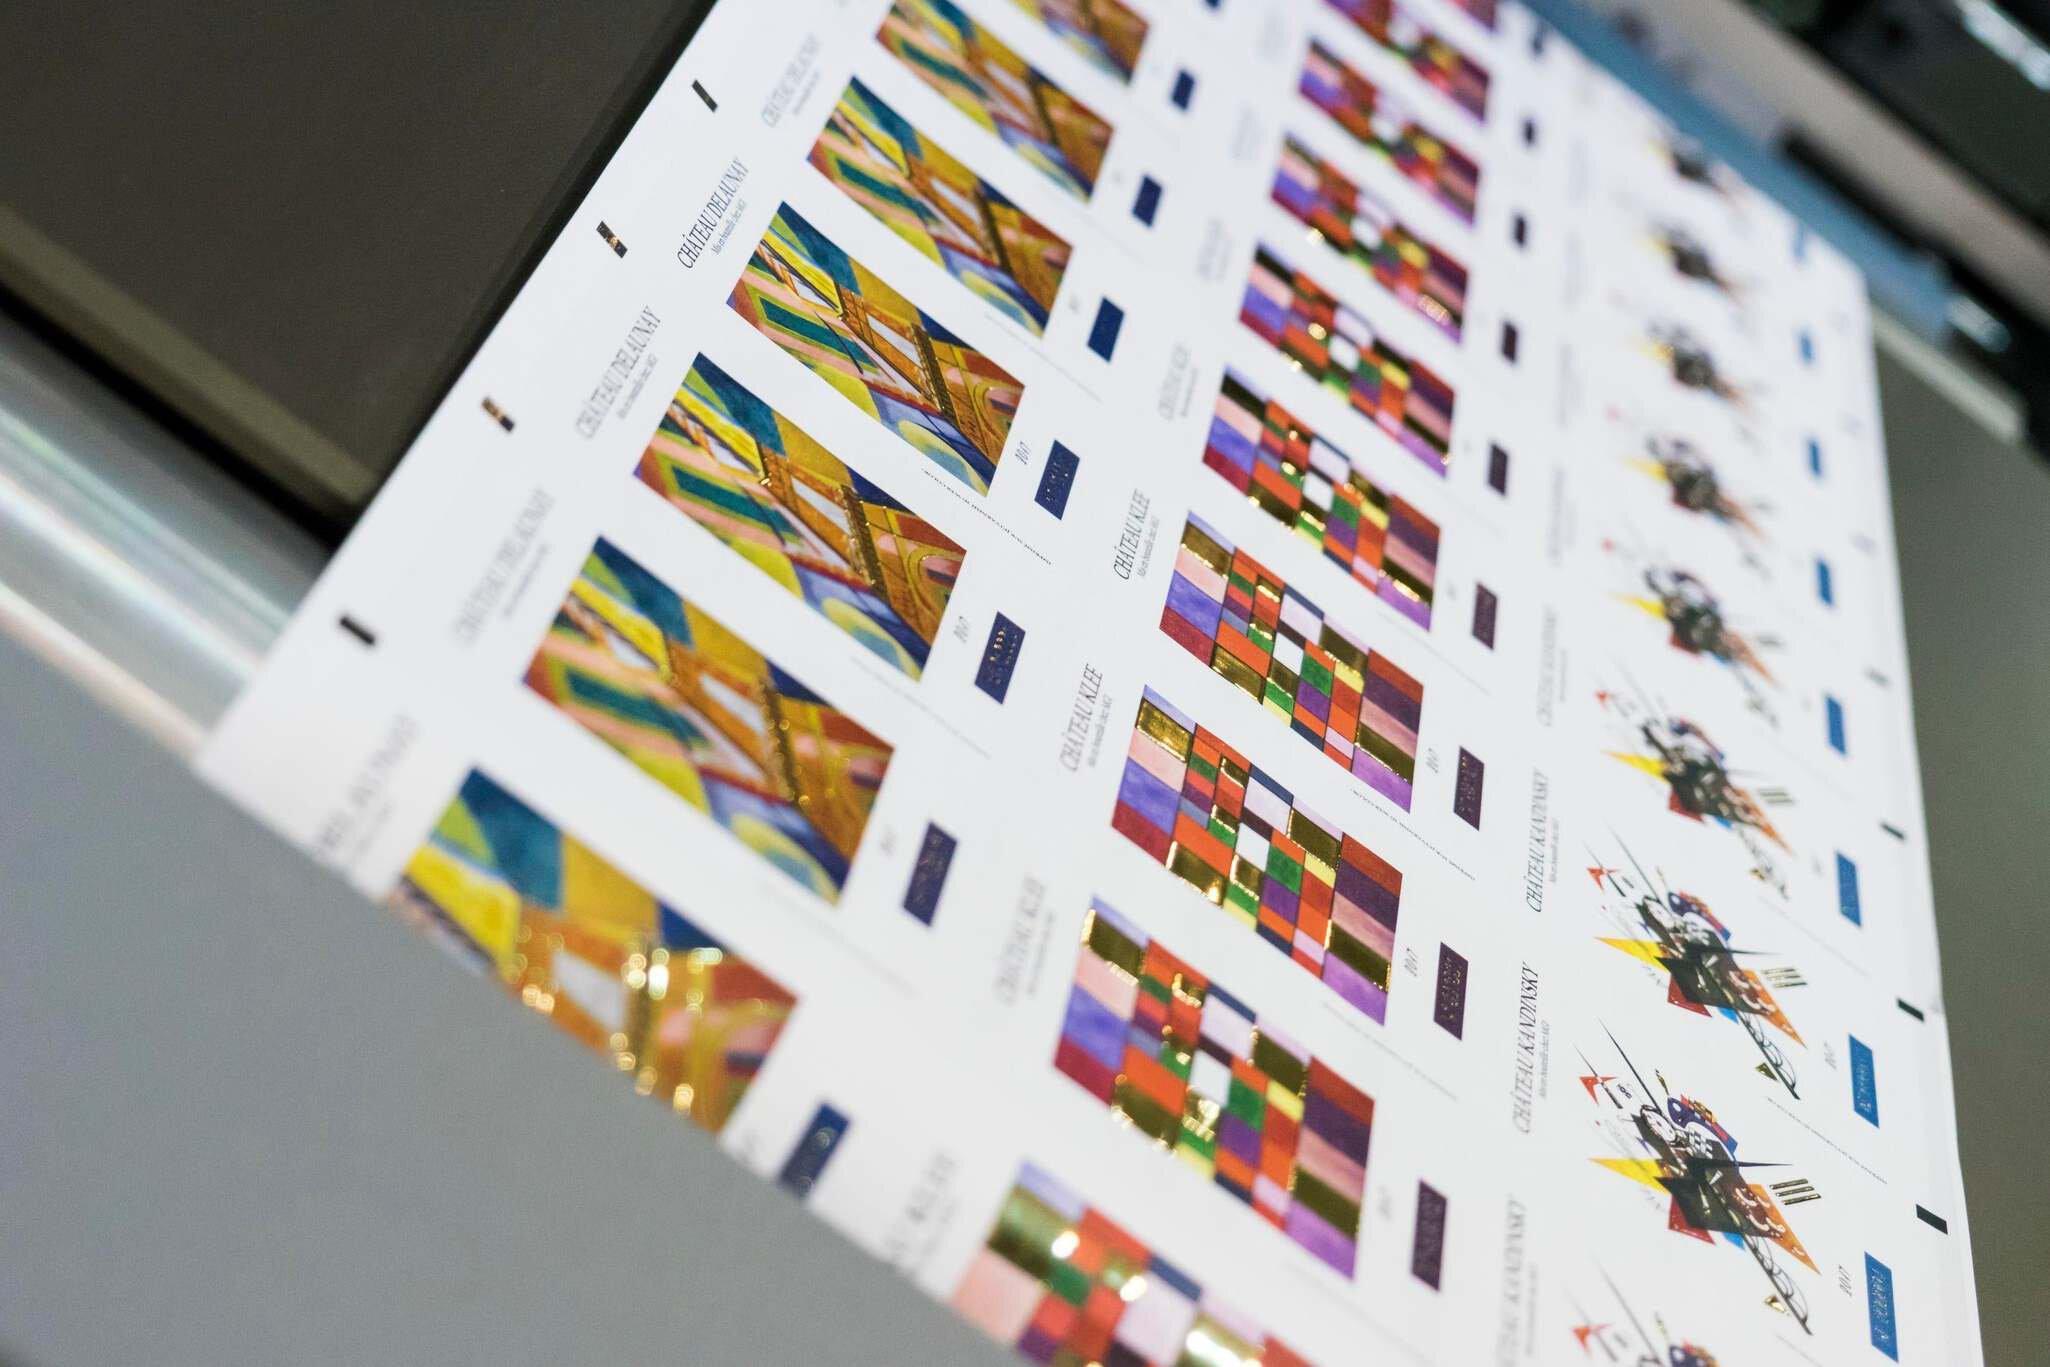 AccurioLabel 230 news image 2